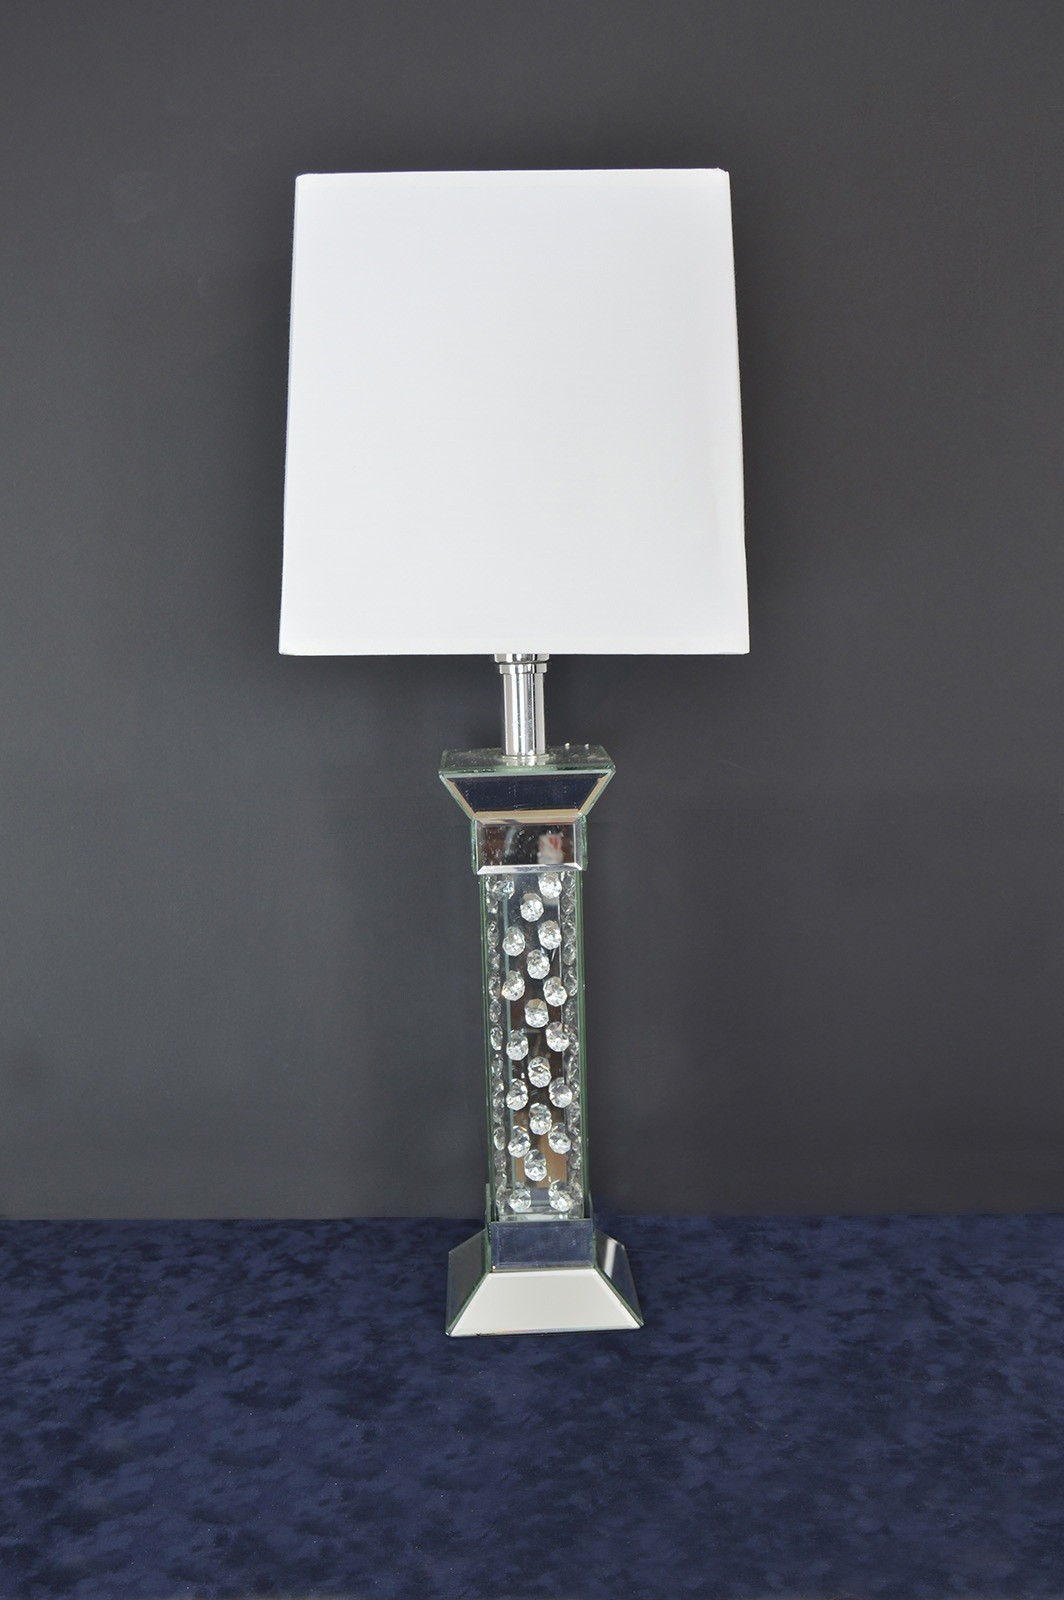 mirror-table-lamp-photo-10